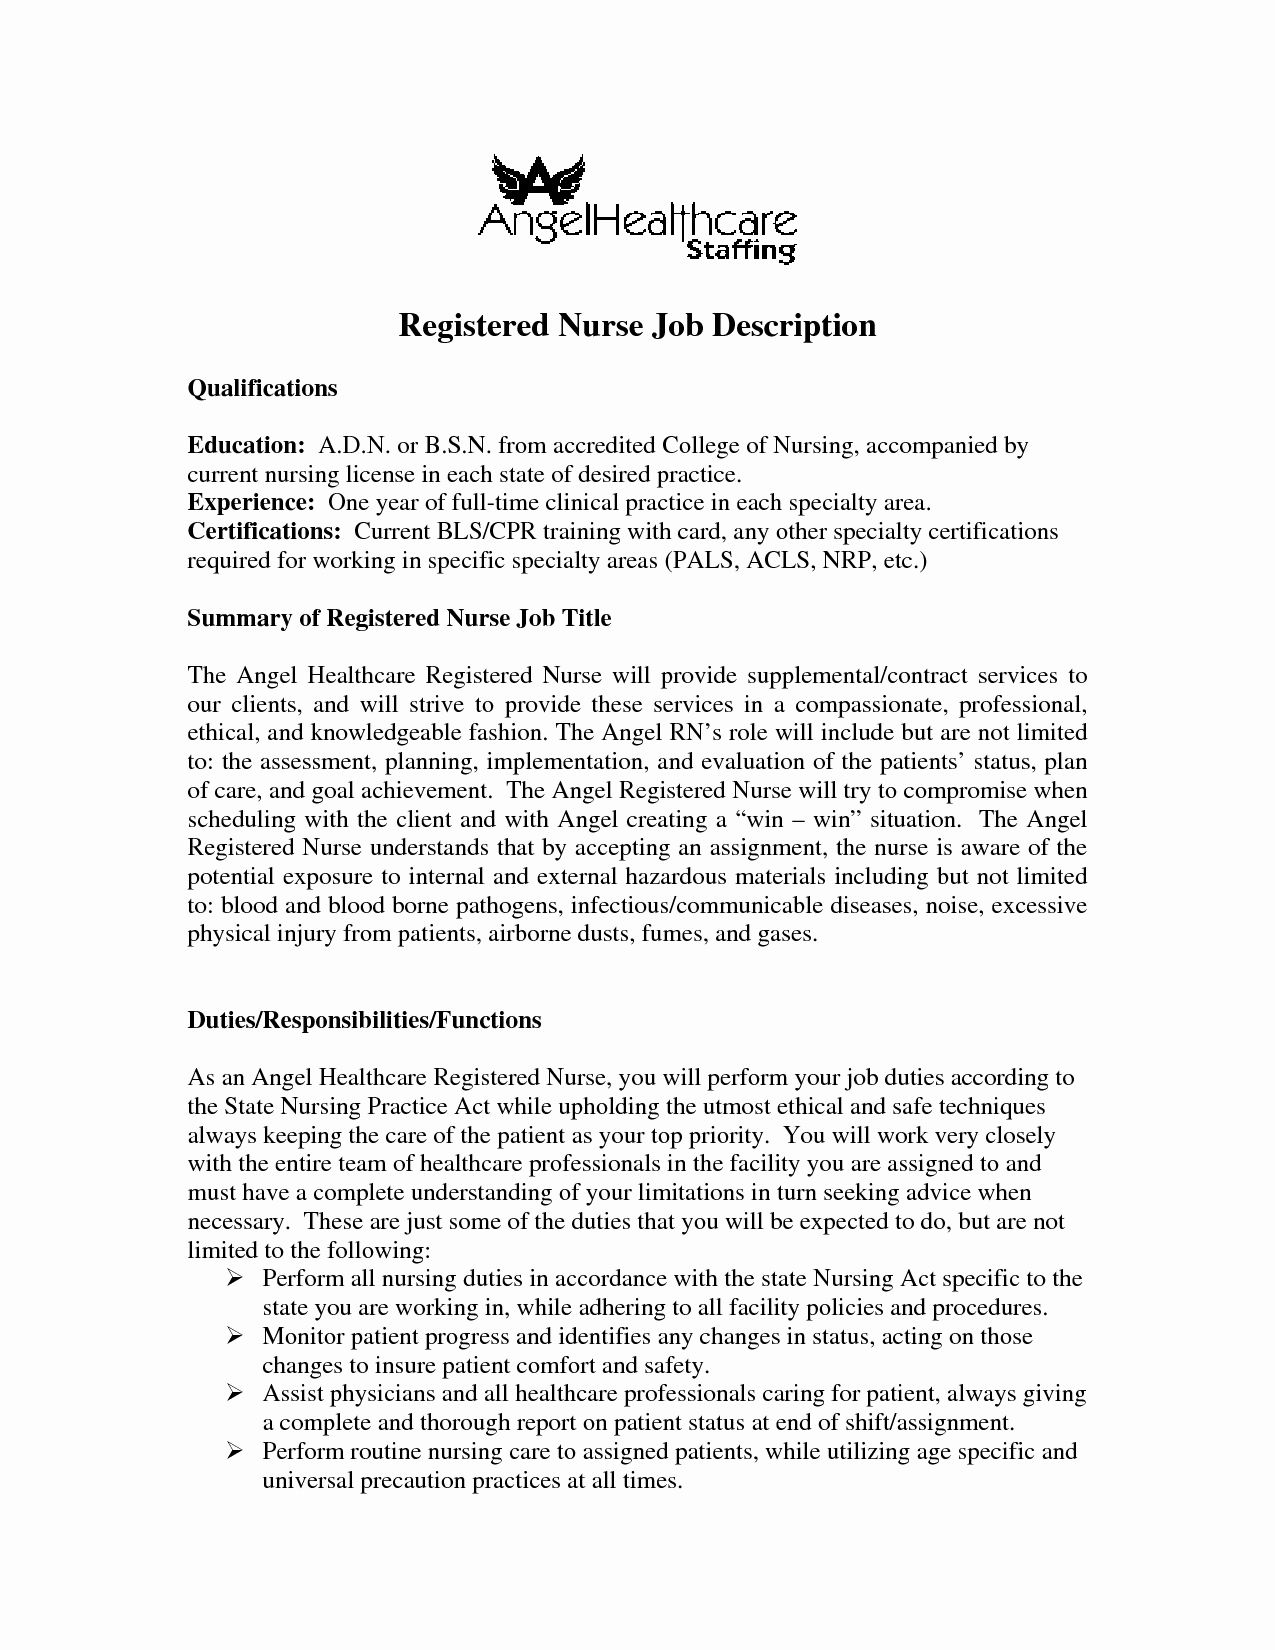 Hiring Registered Nurse Job Description Sample